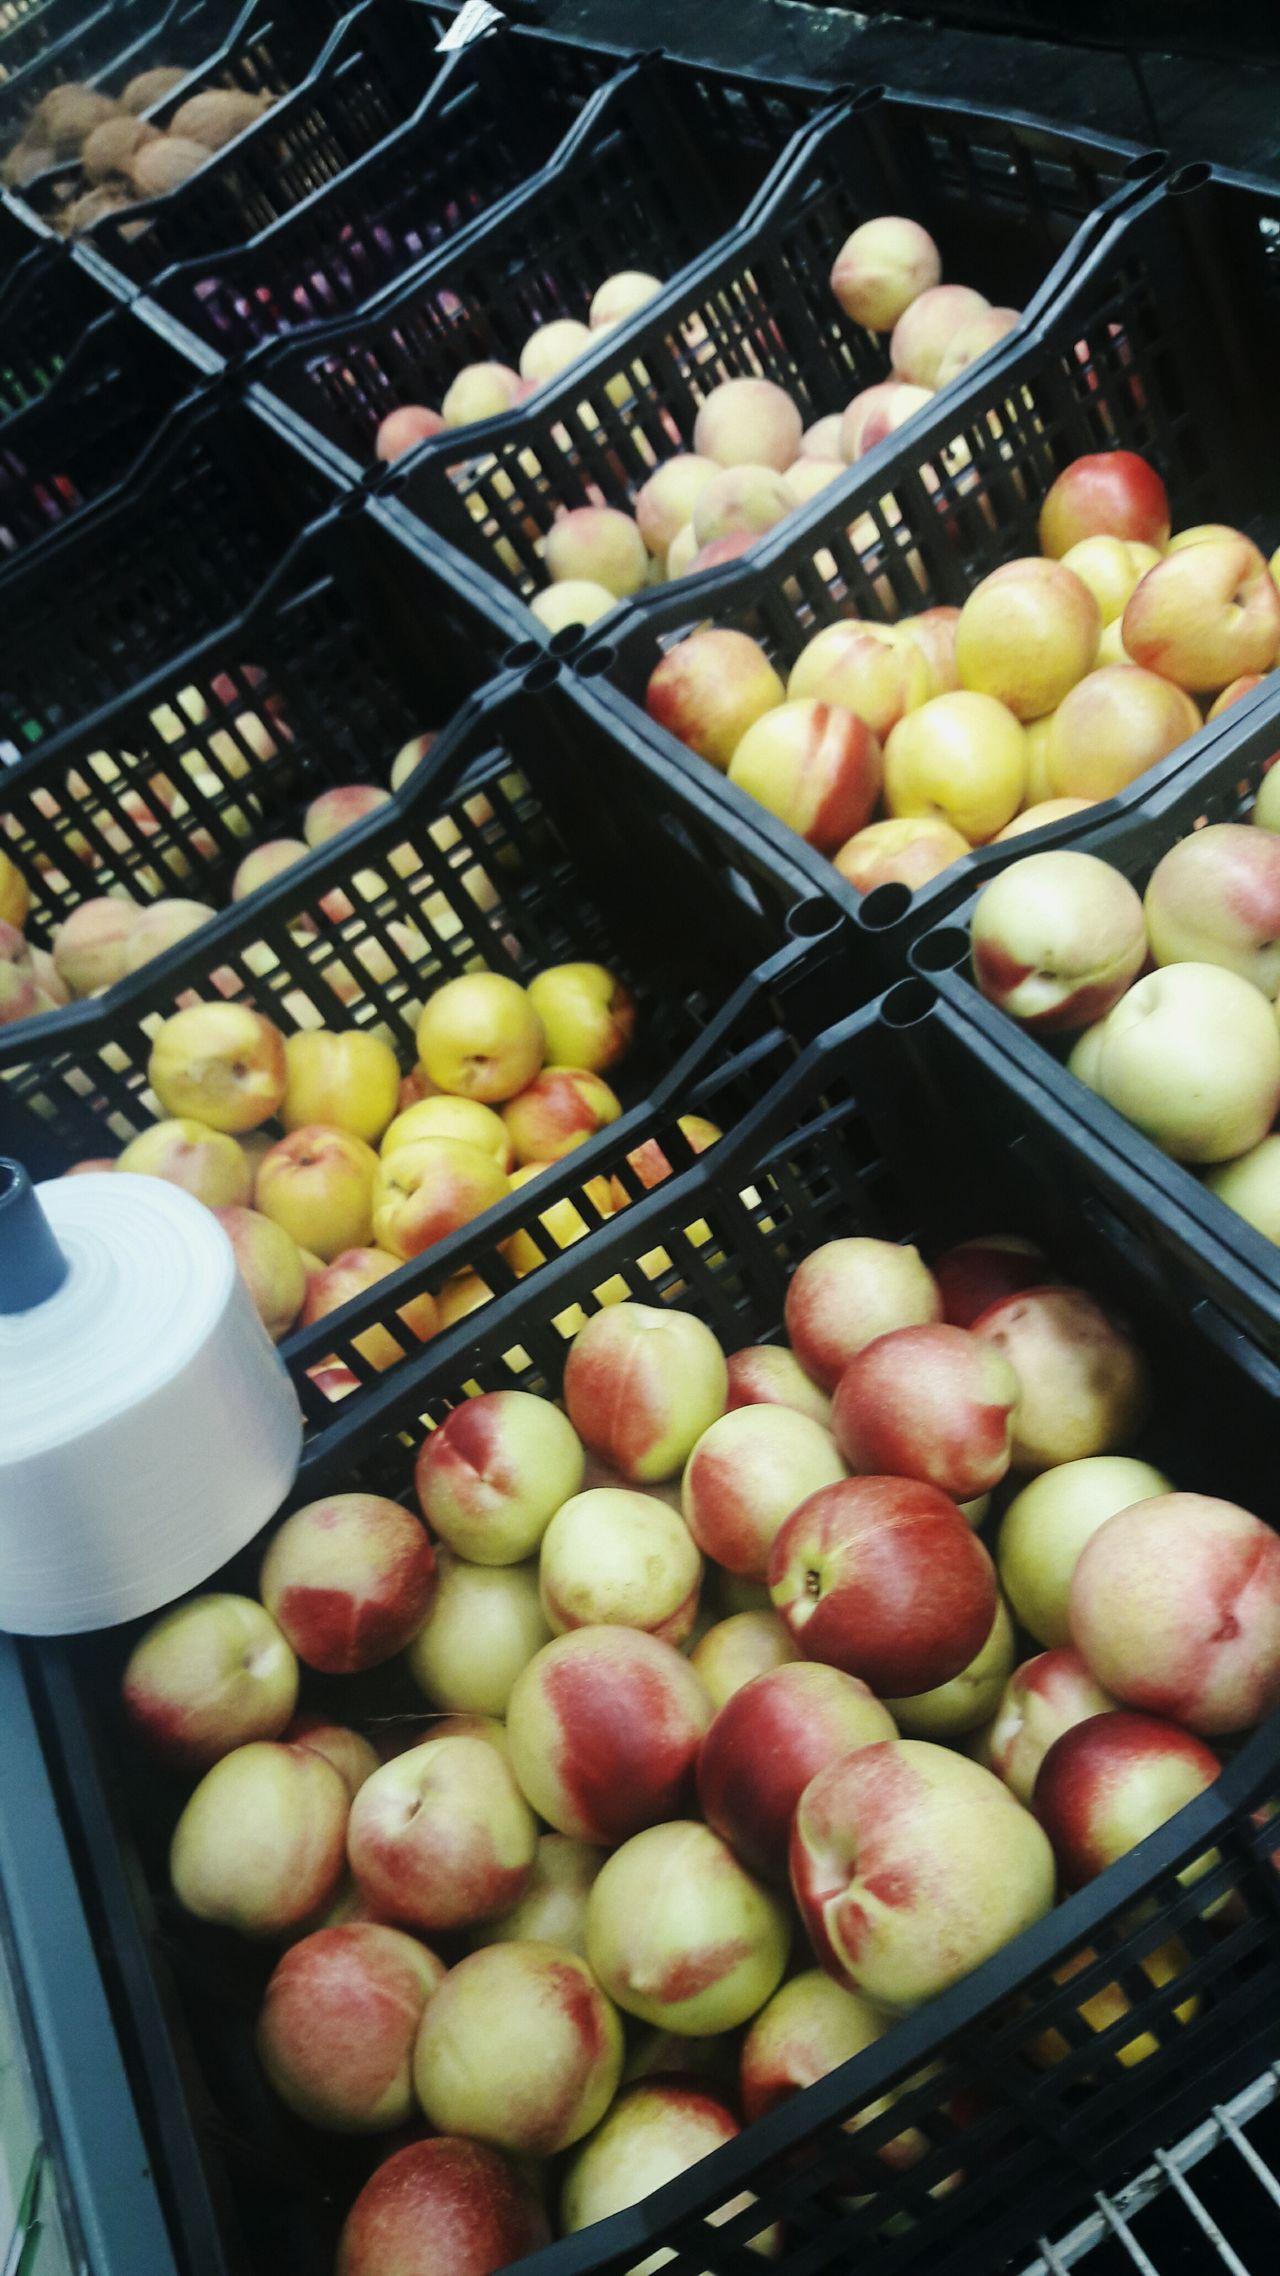 Fruits🍑🍎 Frutas Fruta Fruit Fruits Picoftheday Supermercado Supermarket Abundance Freshness Peach Durazno Duraznos Manzana Manzanas Coco Coconut